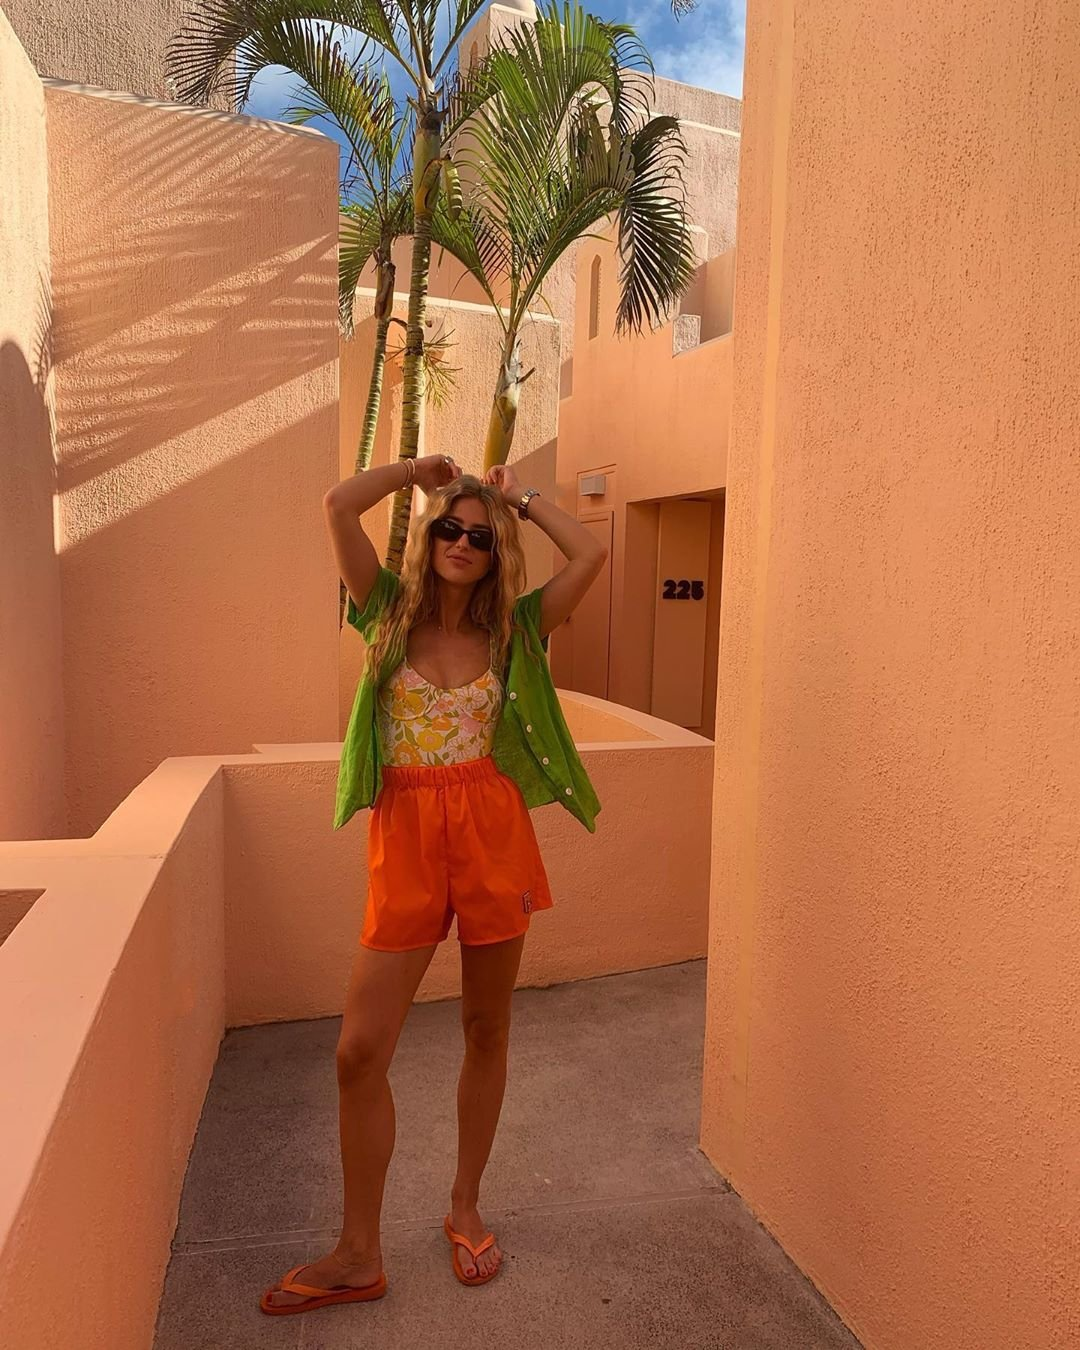 Emili Sindlev - Shorts - Maiô - Primavera - Street Style